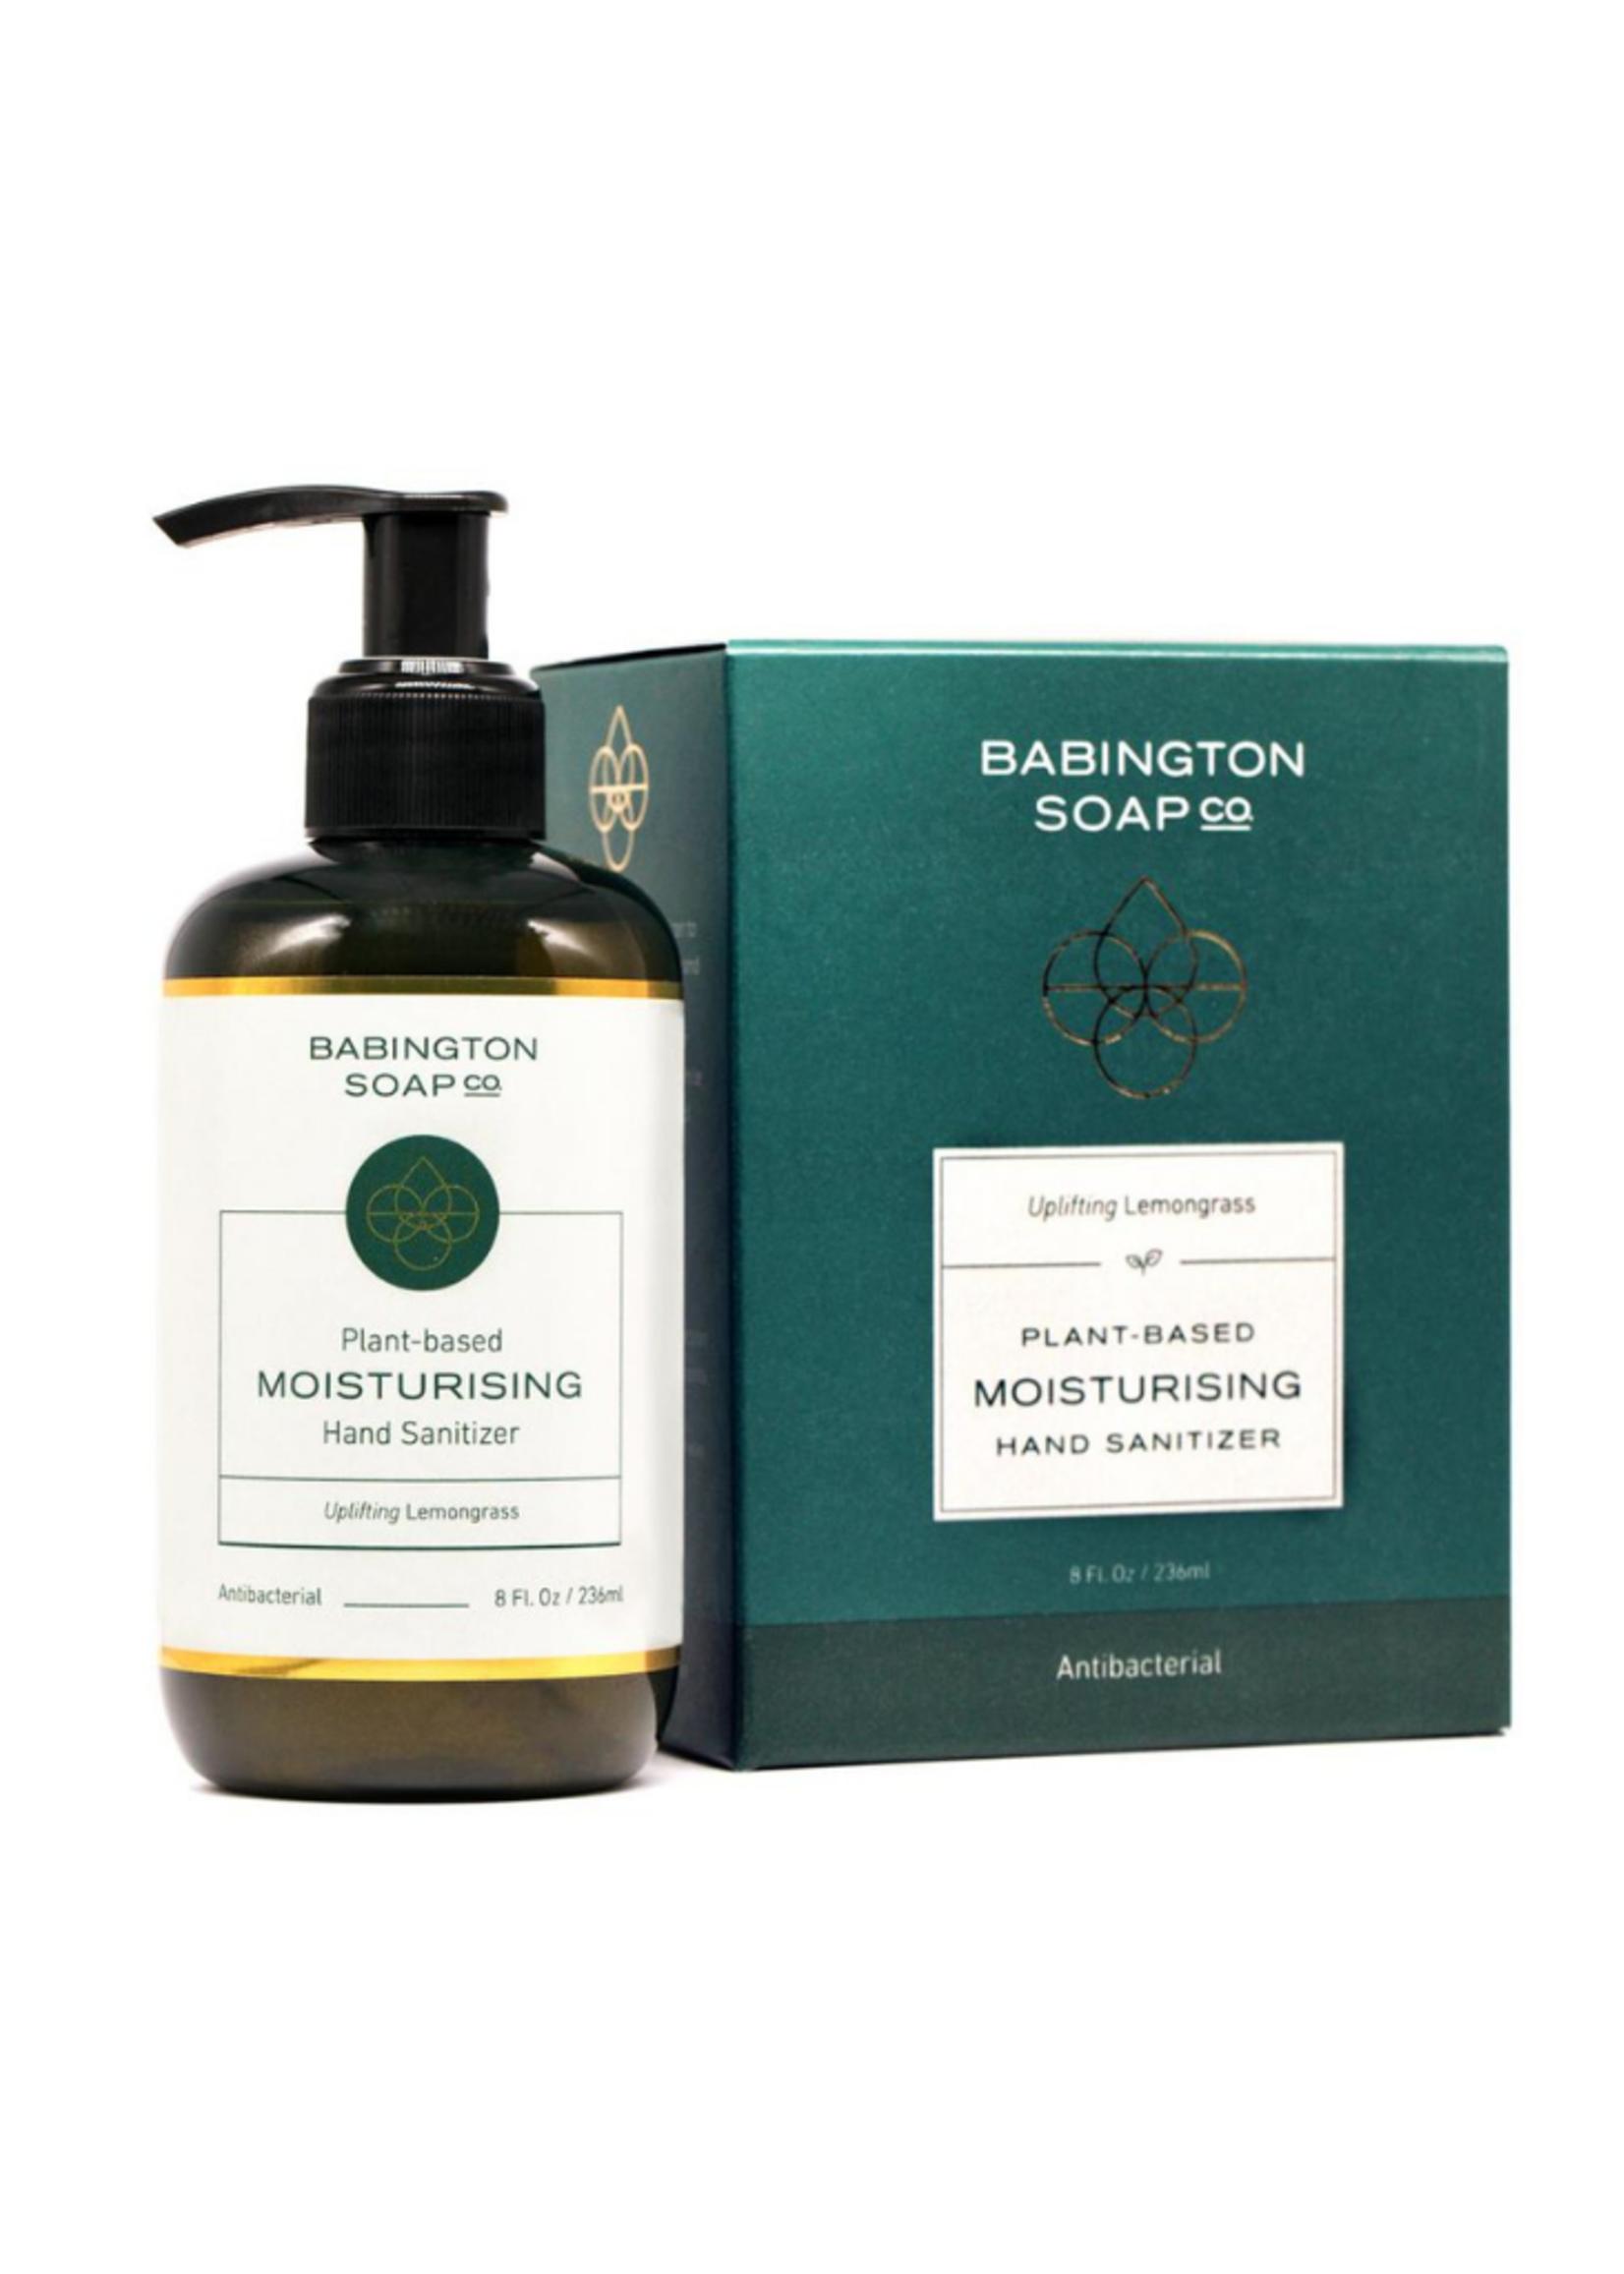 Babington Soap Co. Moisturising Hand Sanitizer